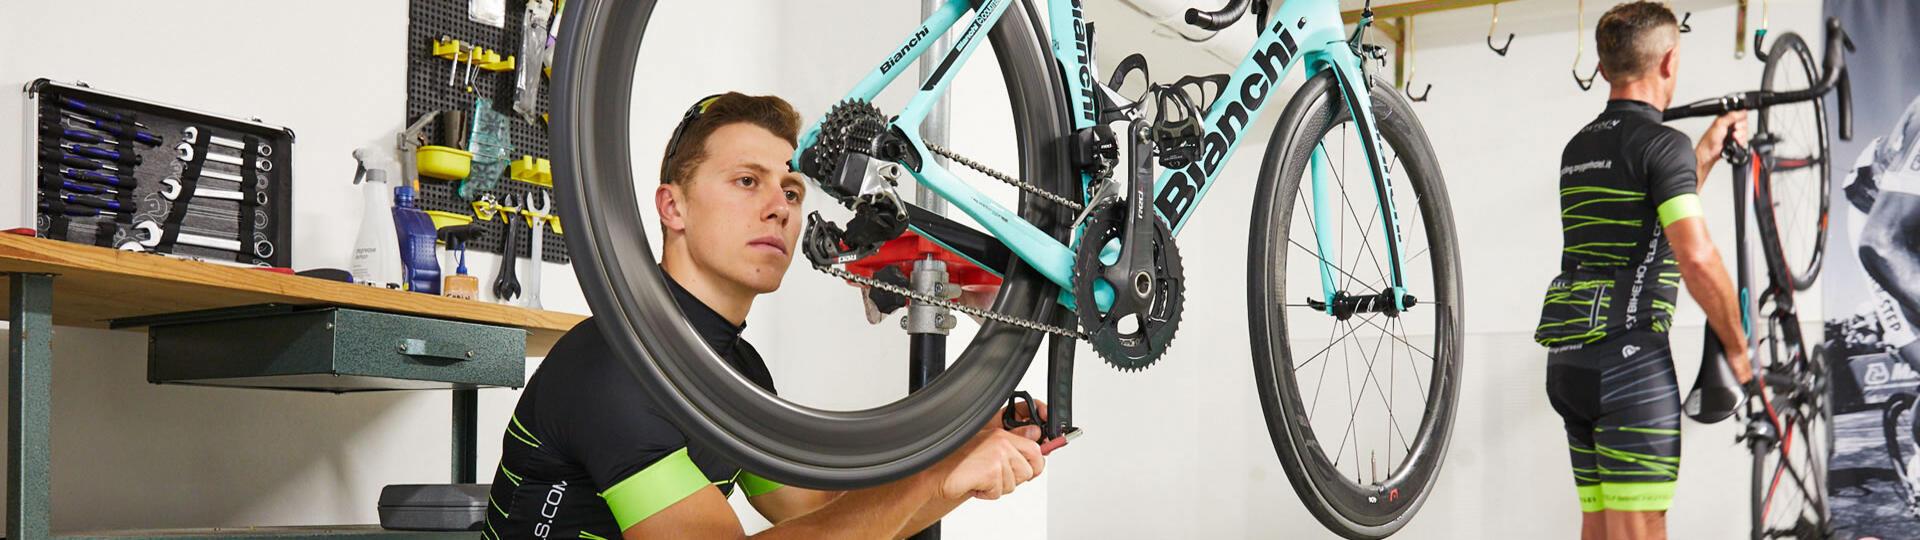 cycling.oxygenhotel en biomechanical-bike-analysis-rimini 012